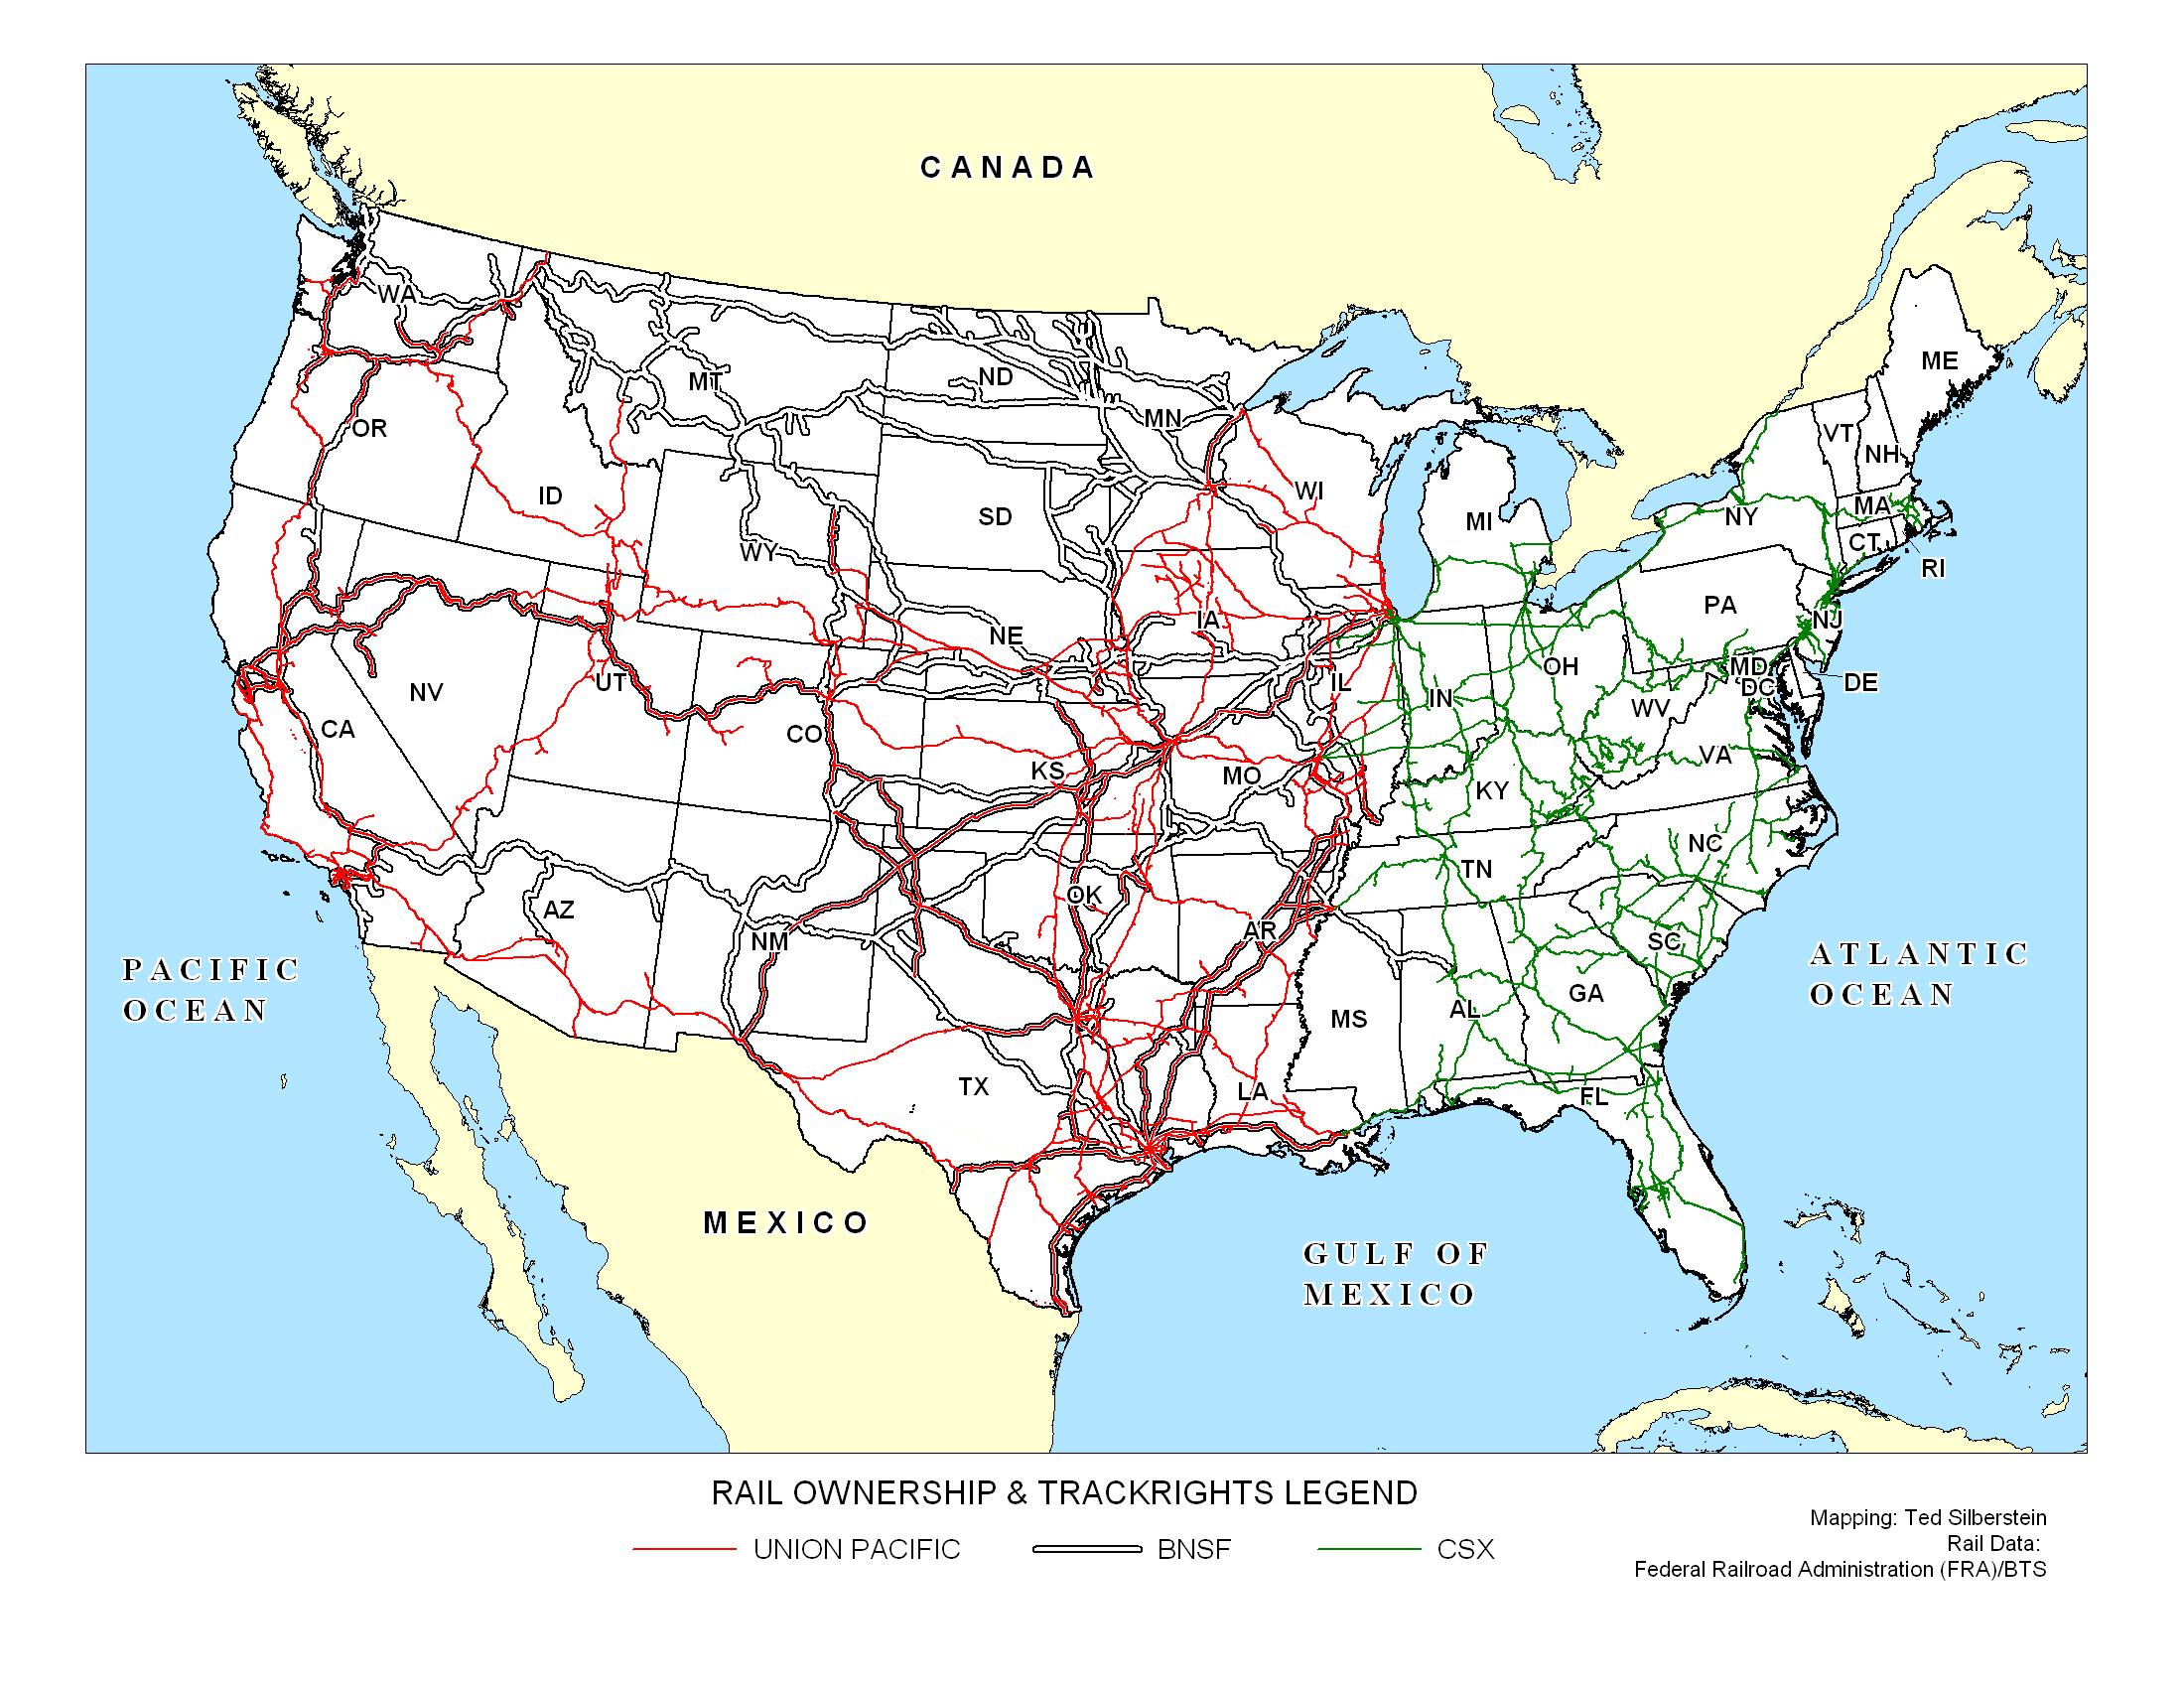 Maps S Railroads In Florida United States Historical Maps - Us railroad map 1880